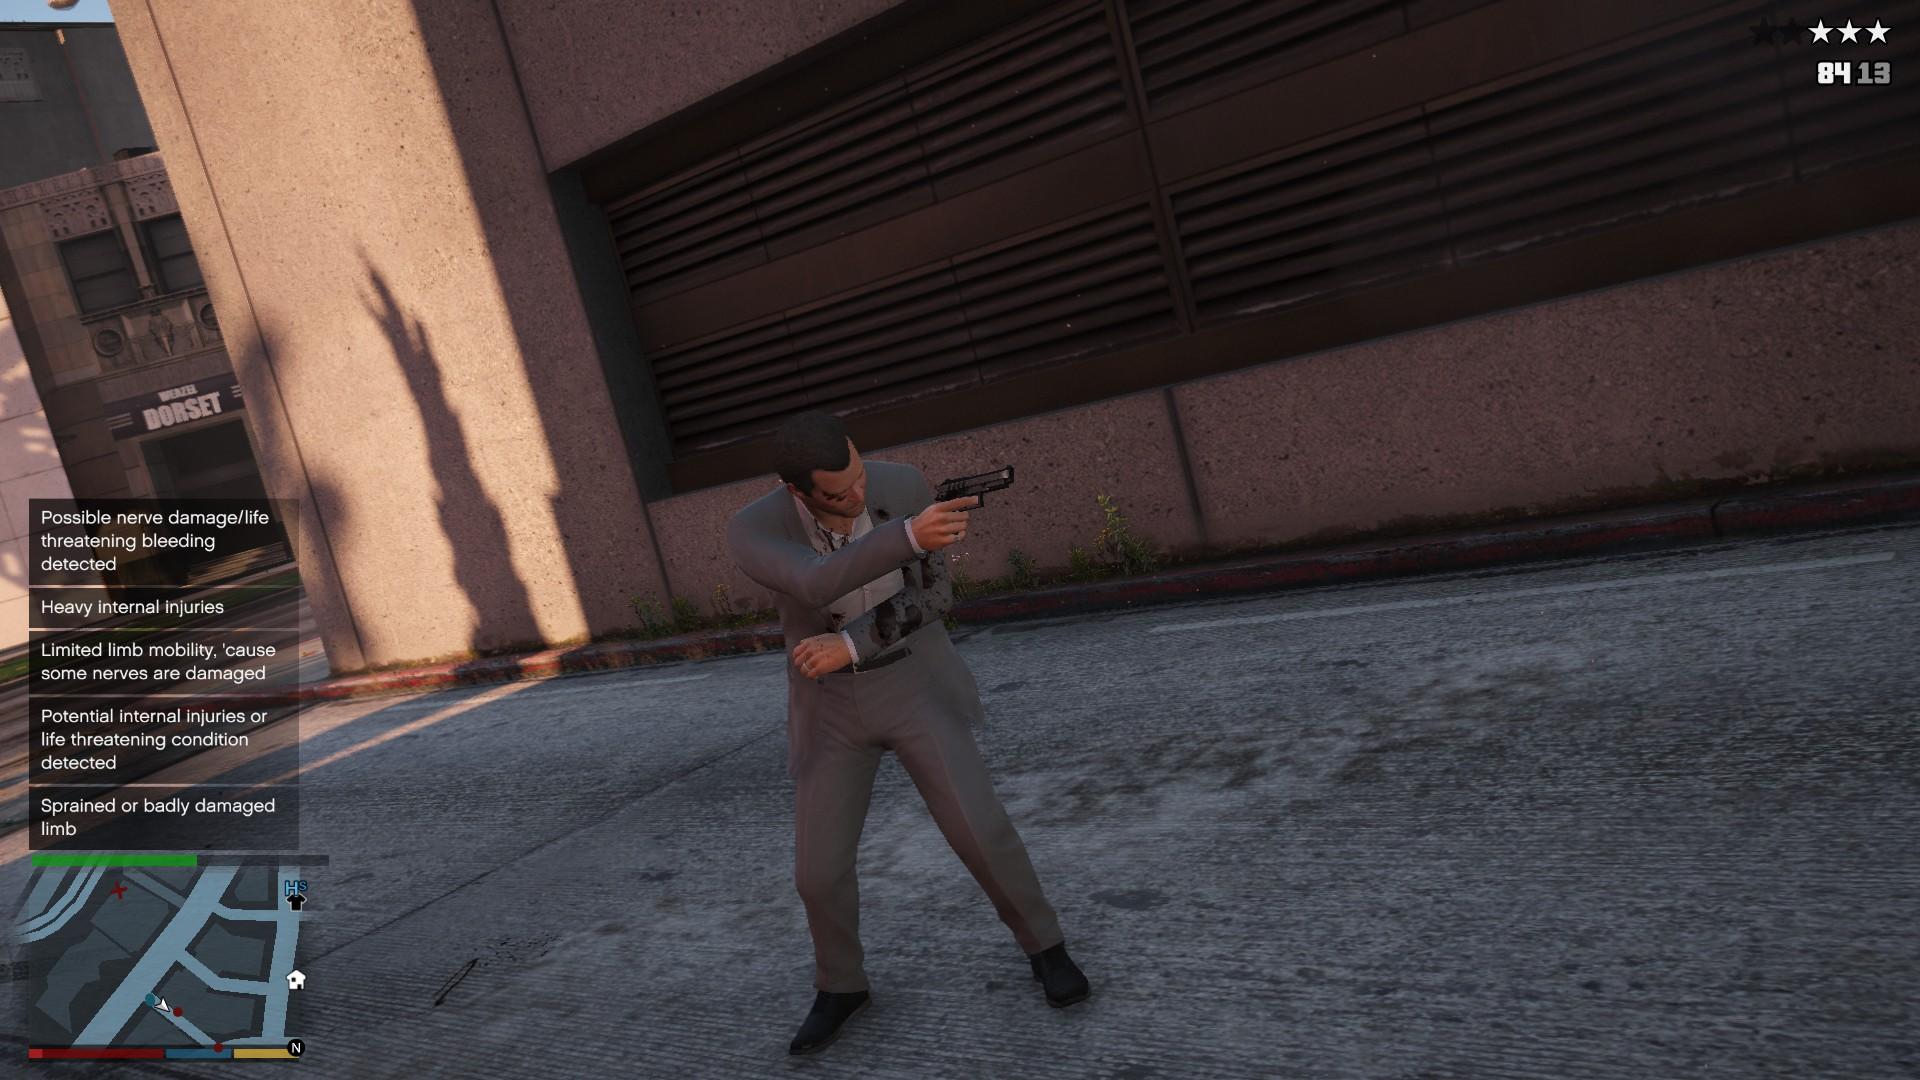 GSW] GunShot Wound mod for Grand Theft Auto V - Mod DB